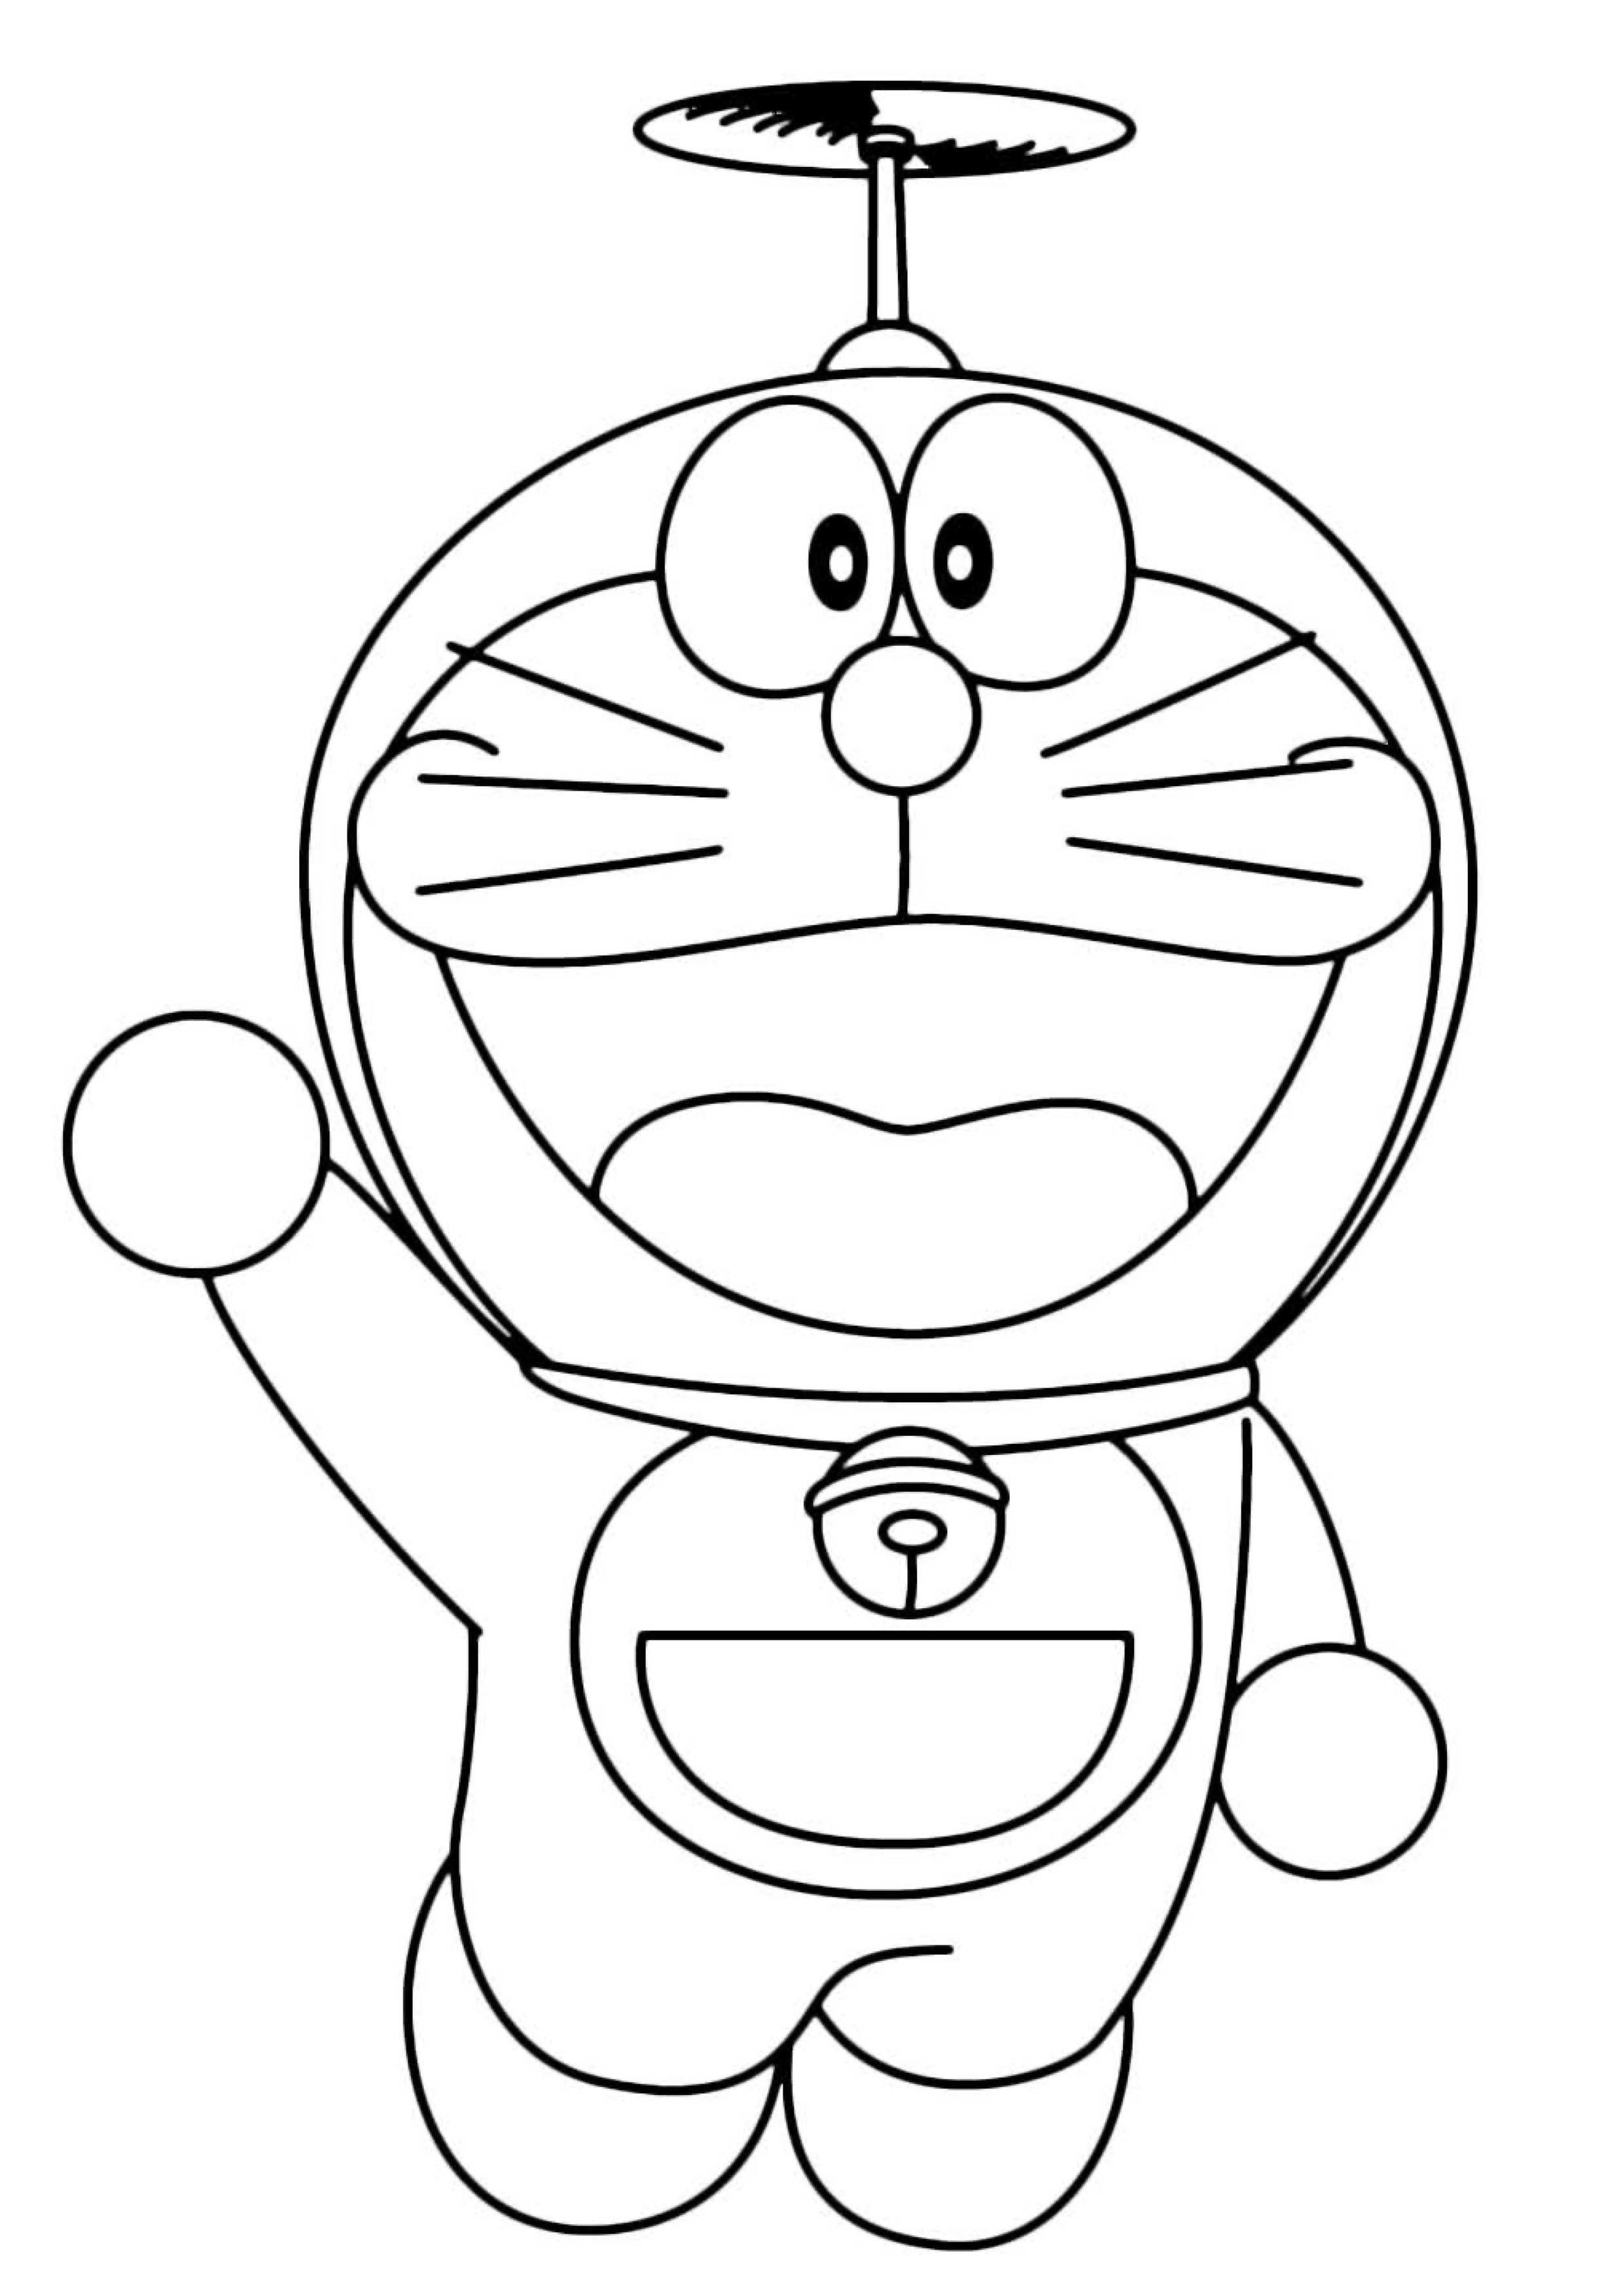 Doraemon-14